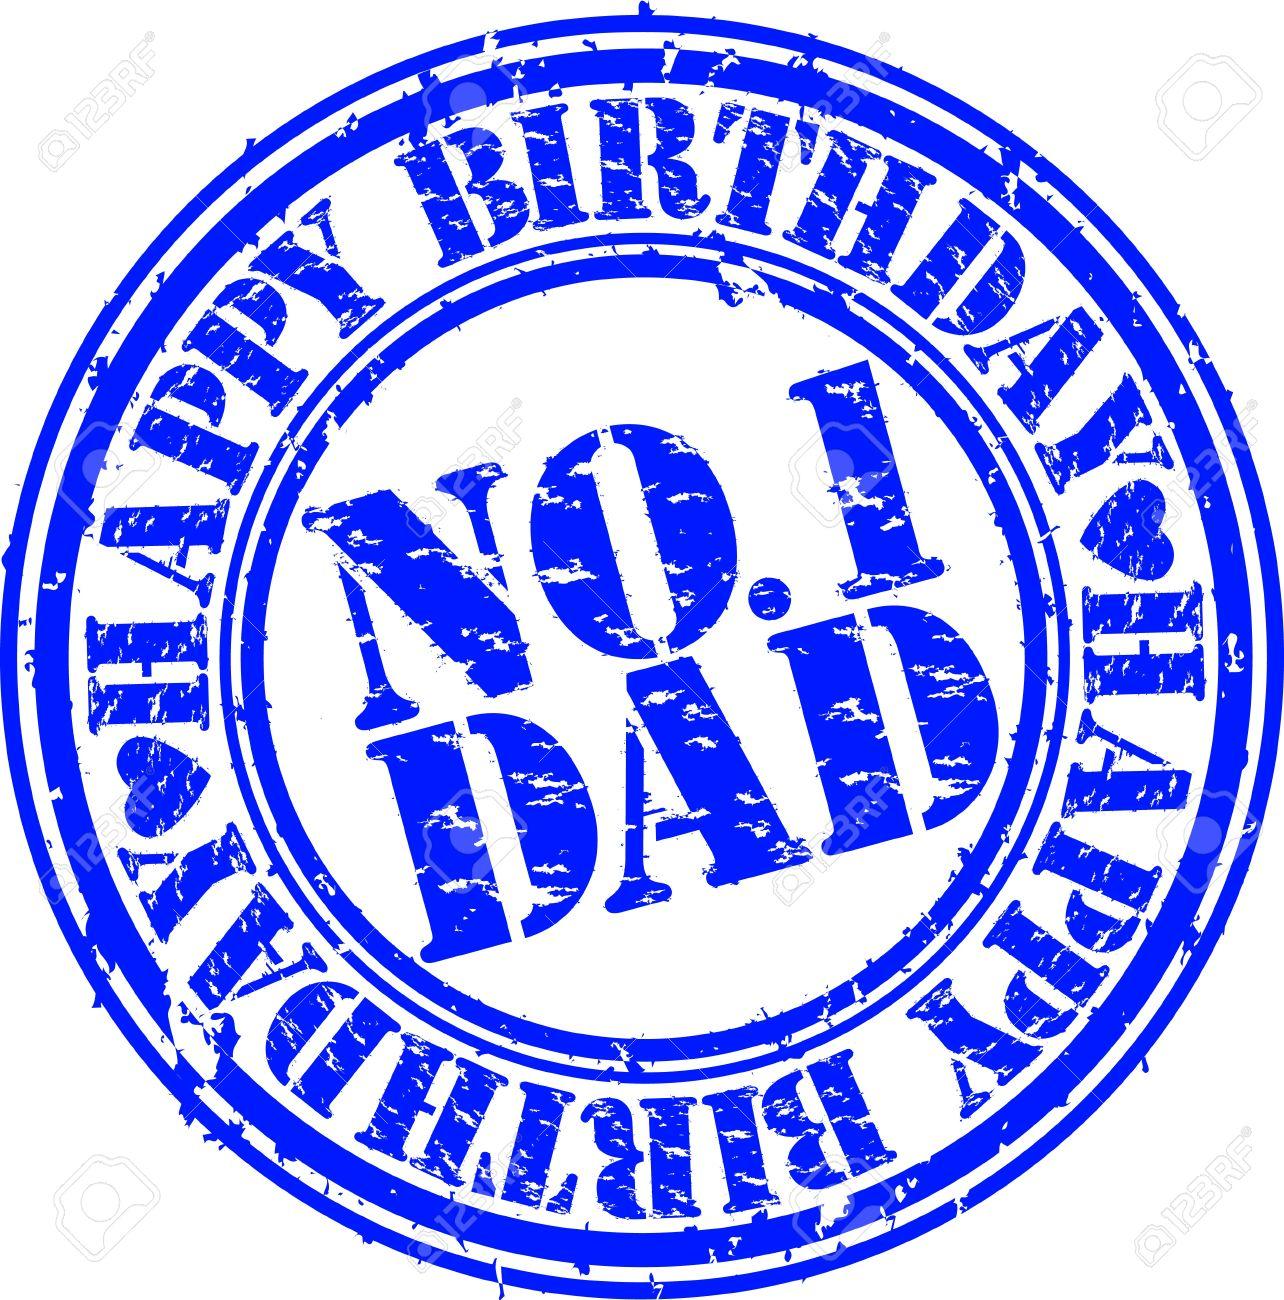 Grunge happy birthday dad, vector illustration Stock Vector - 13610805